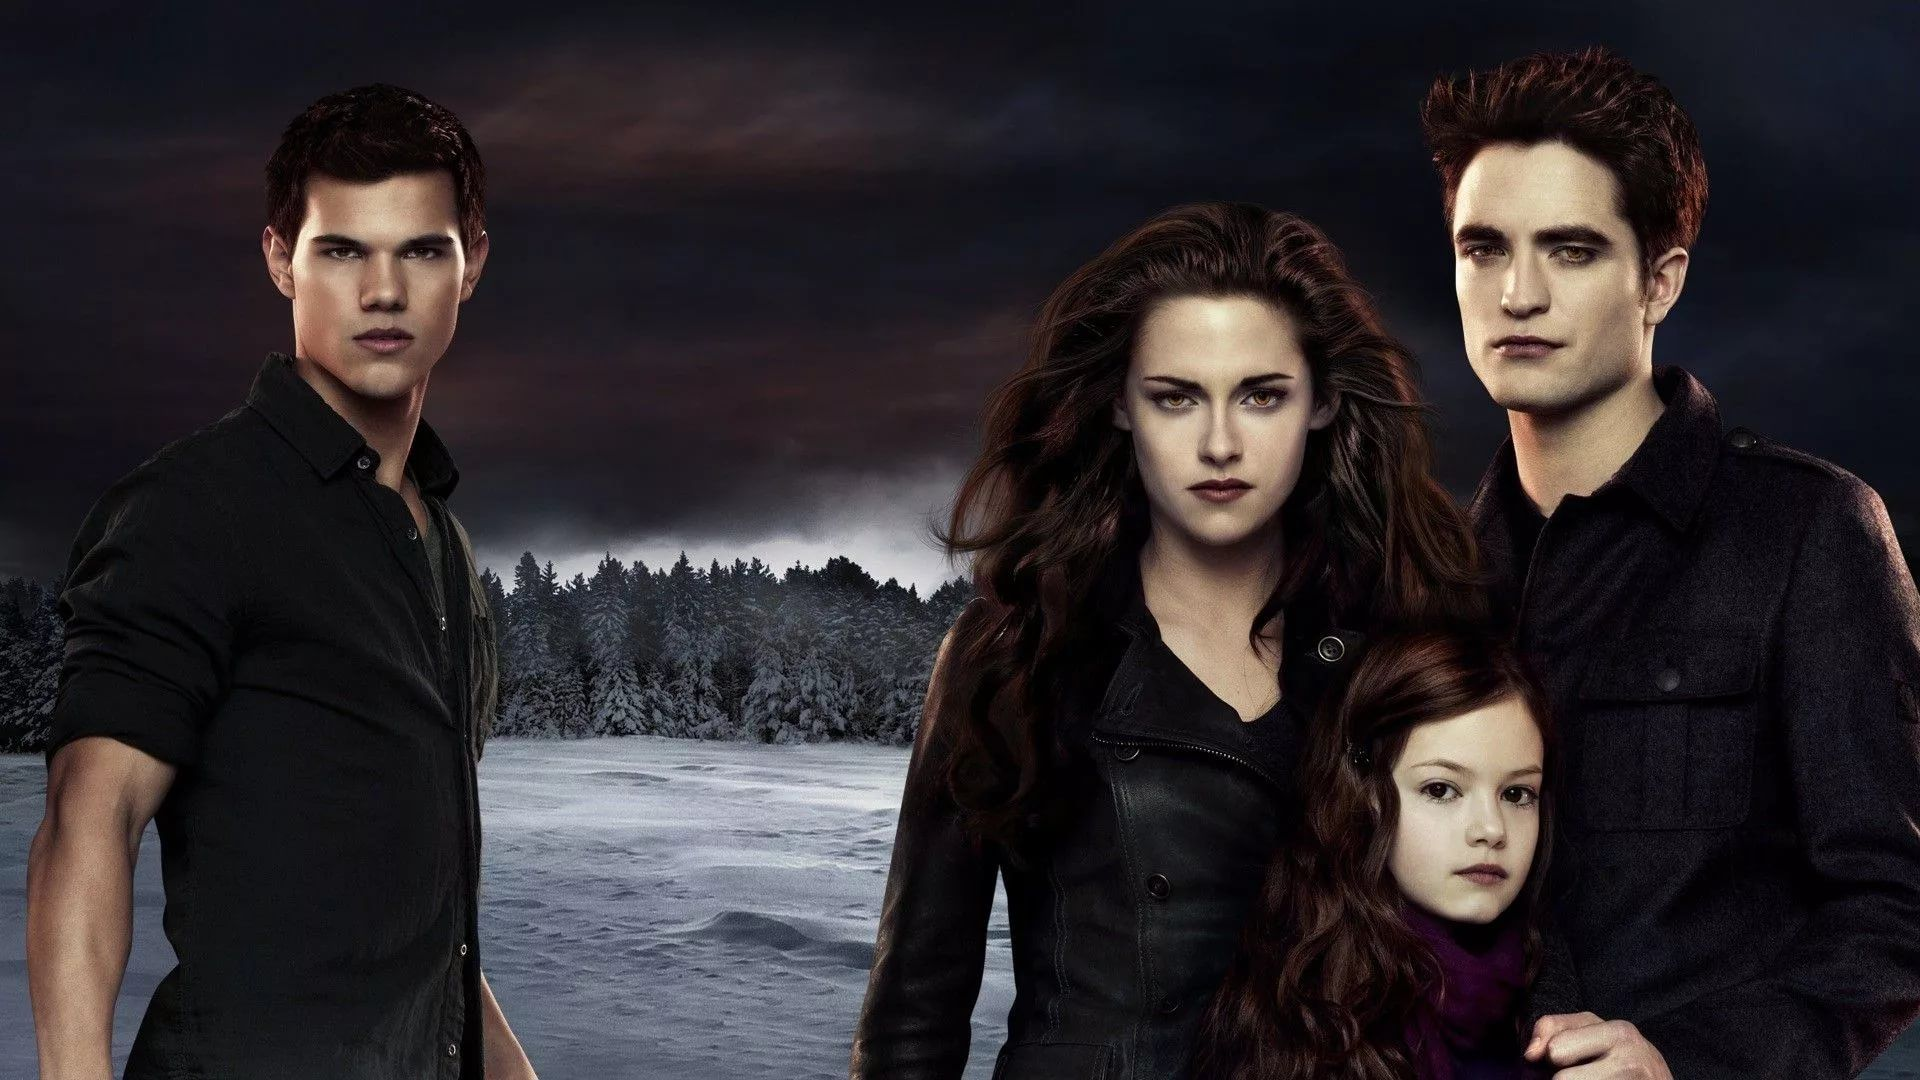 Twilight Saga wallpaper image hd